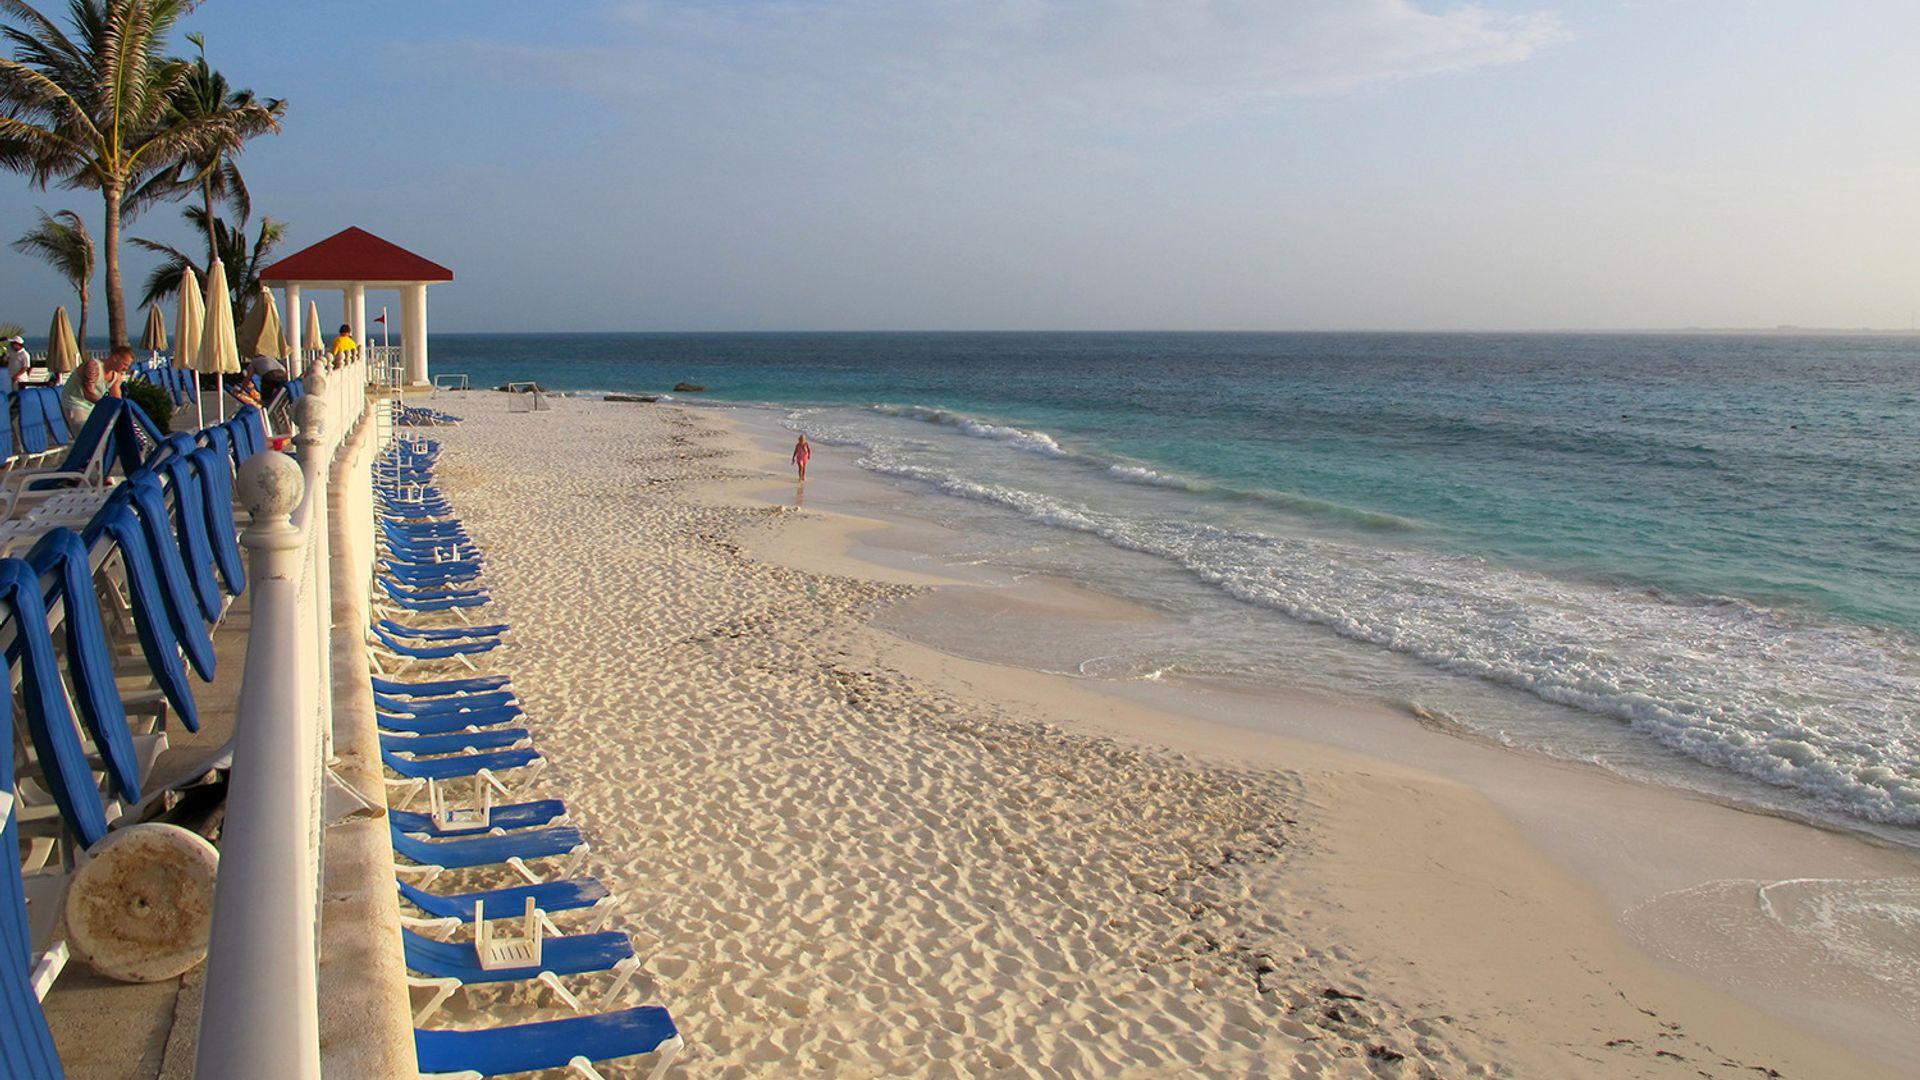 Sejur plaja Cancun, Mexic, 9 zile - februarie 2022